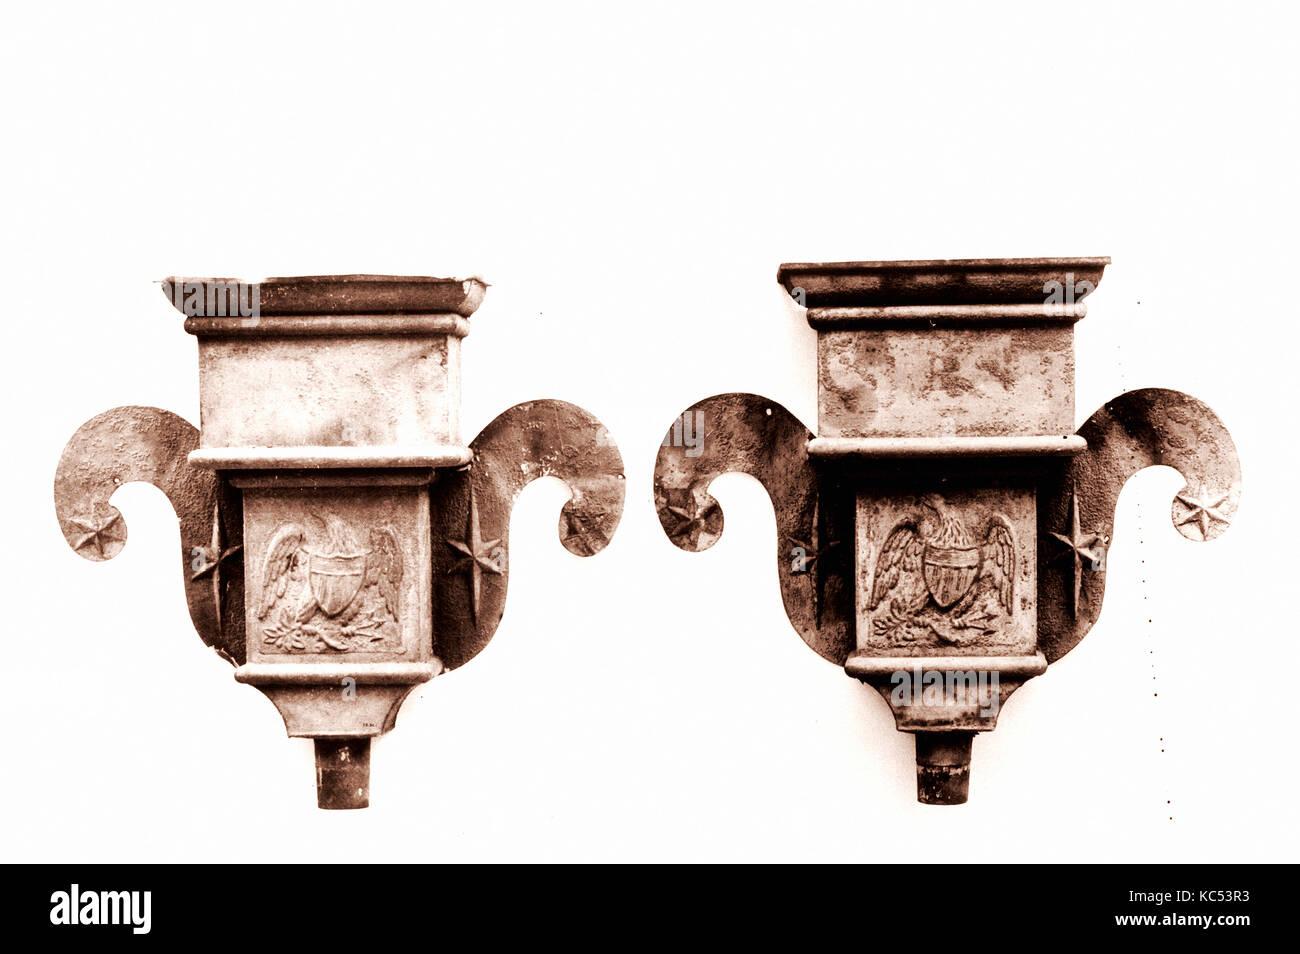 Rainwater Leader, 1800–1830, Painted tin, 19 1/2 x 23 in. (49.5 x 58.4 cm), Metal - Stock Image